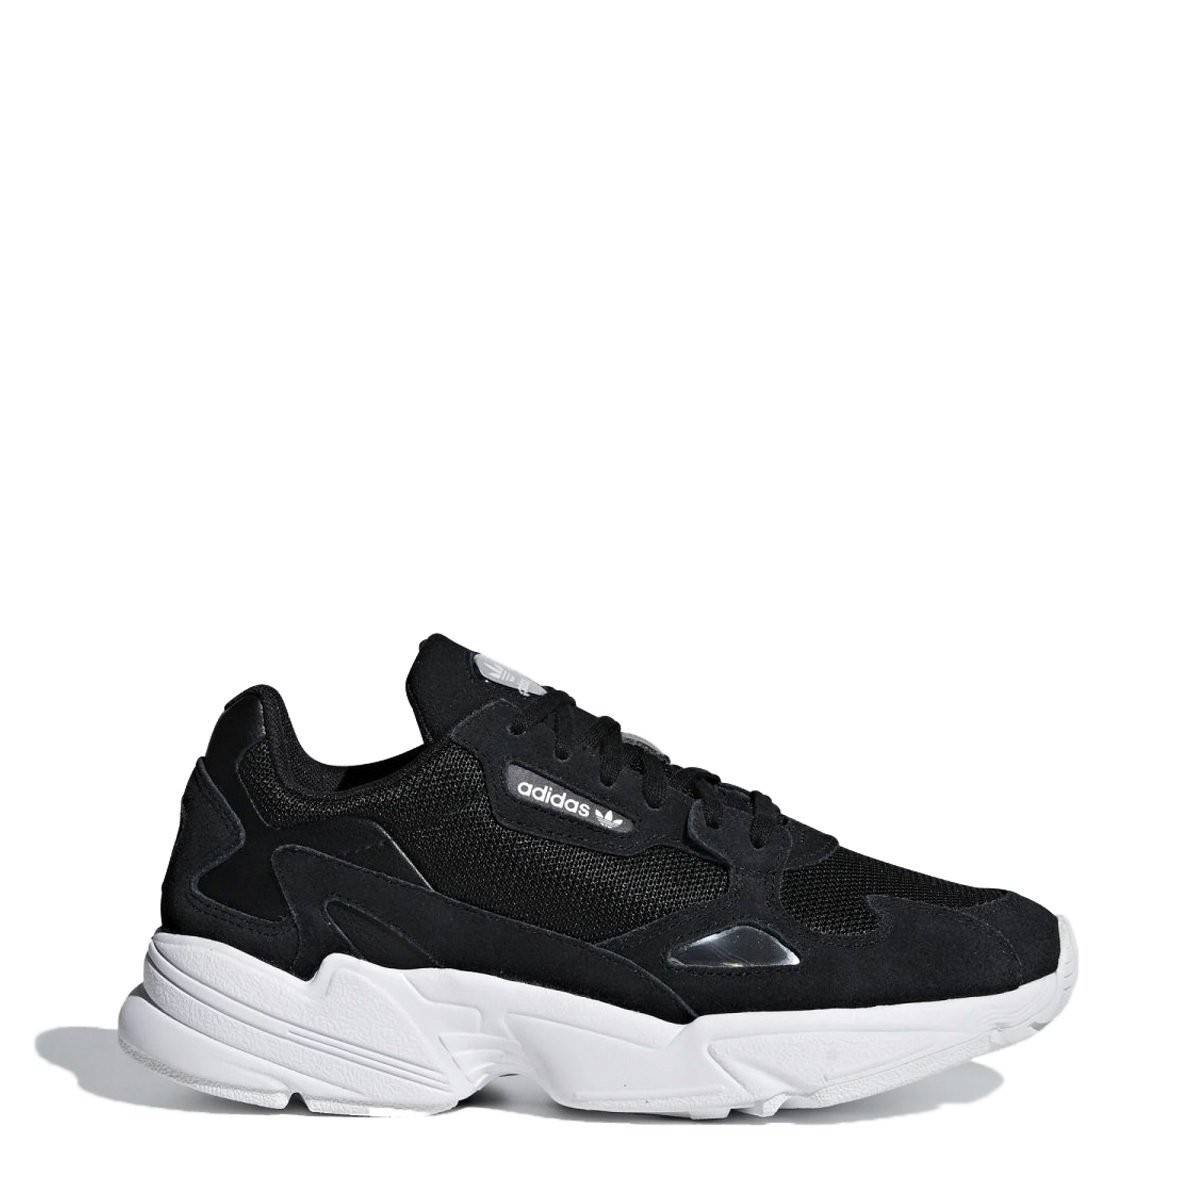 adidas Originals Falcon Kadın Ayakkabısı B28129